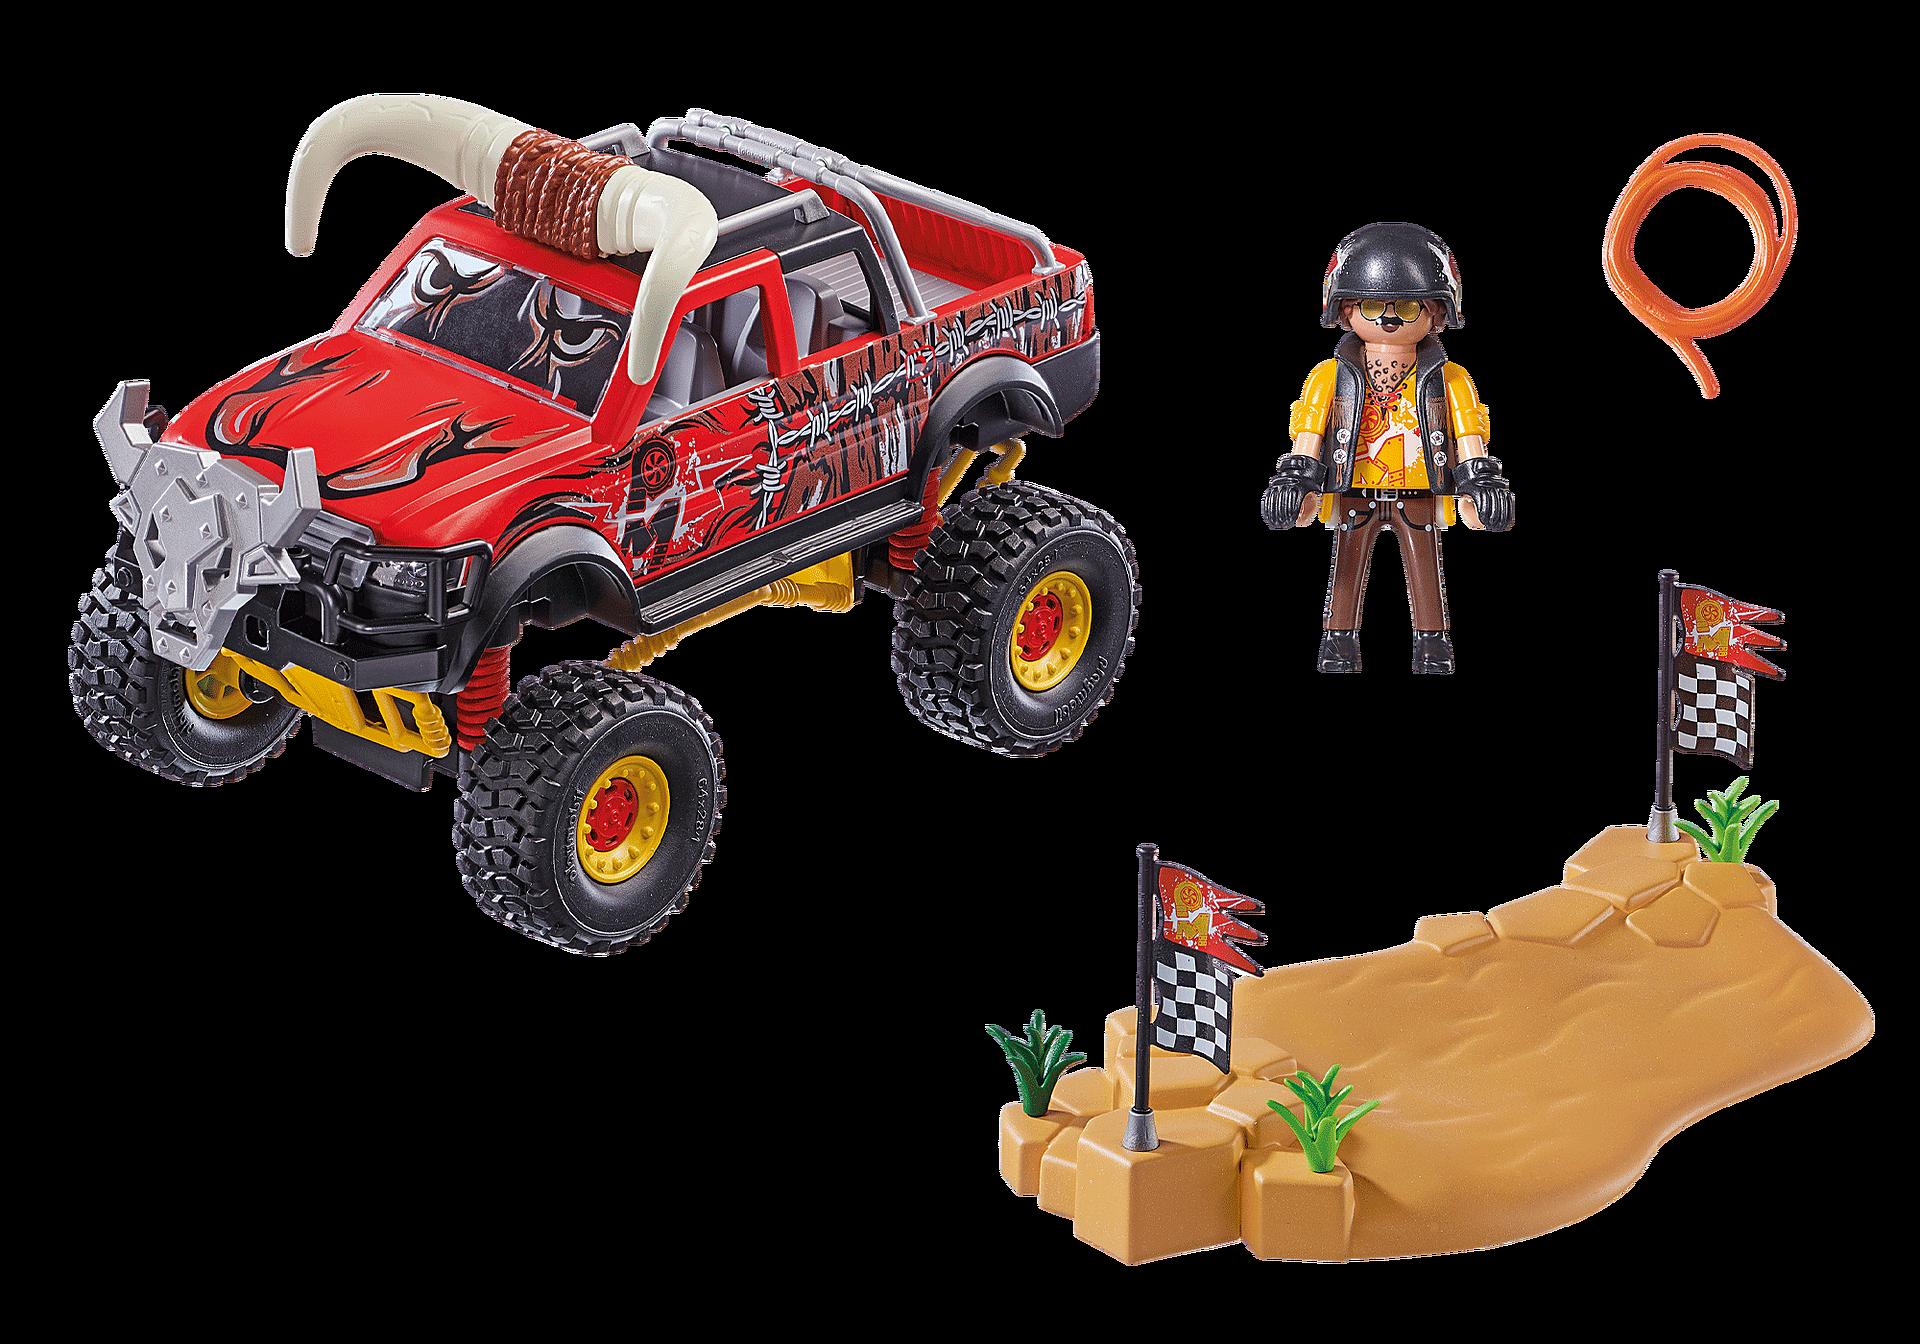 70549 Monster Truck Bika zoom image3